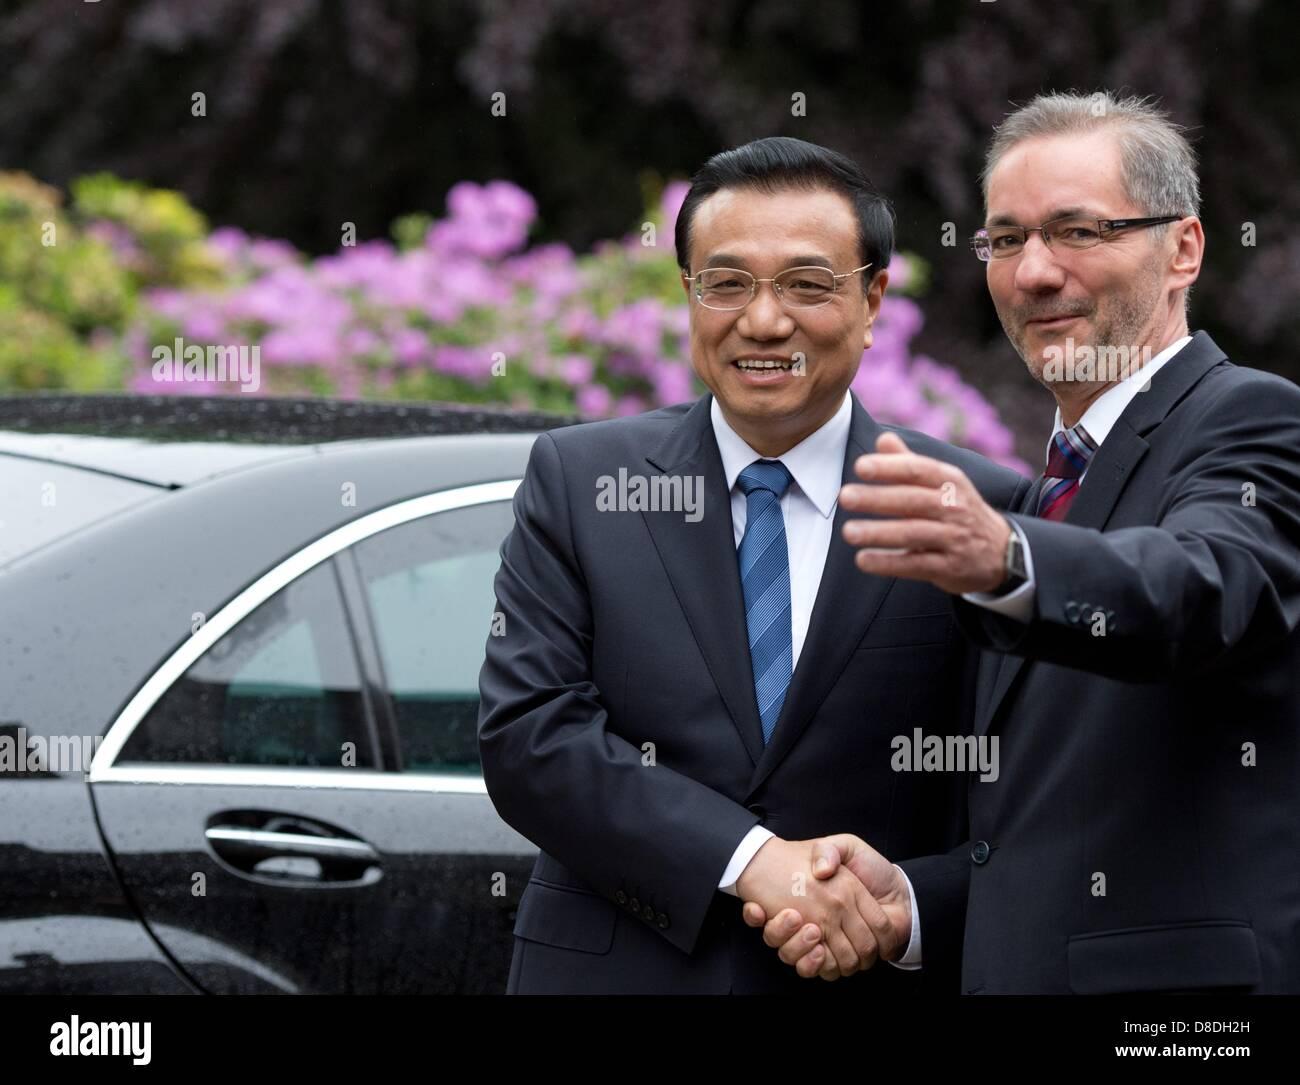 Premier of Brandenburg Matthias Platzeck greets Premier of China Li Keqiangoutside of the Cecilienhof in Potsdam, - Stock Image